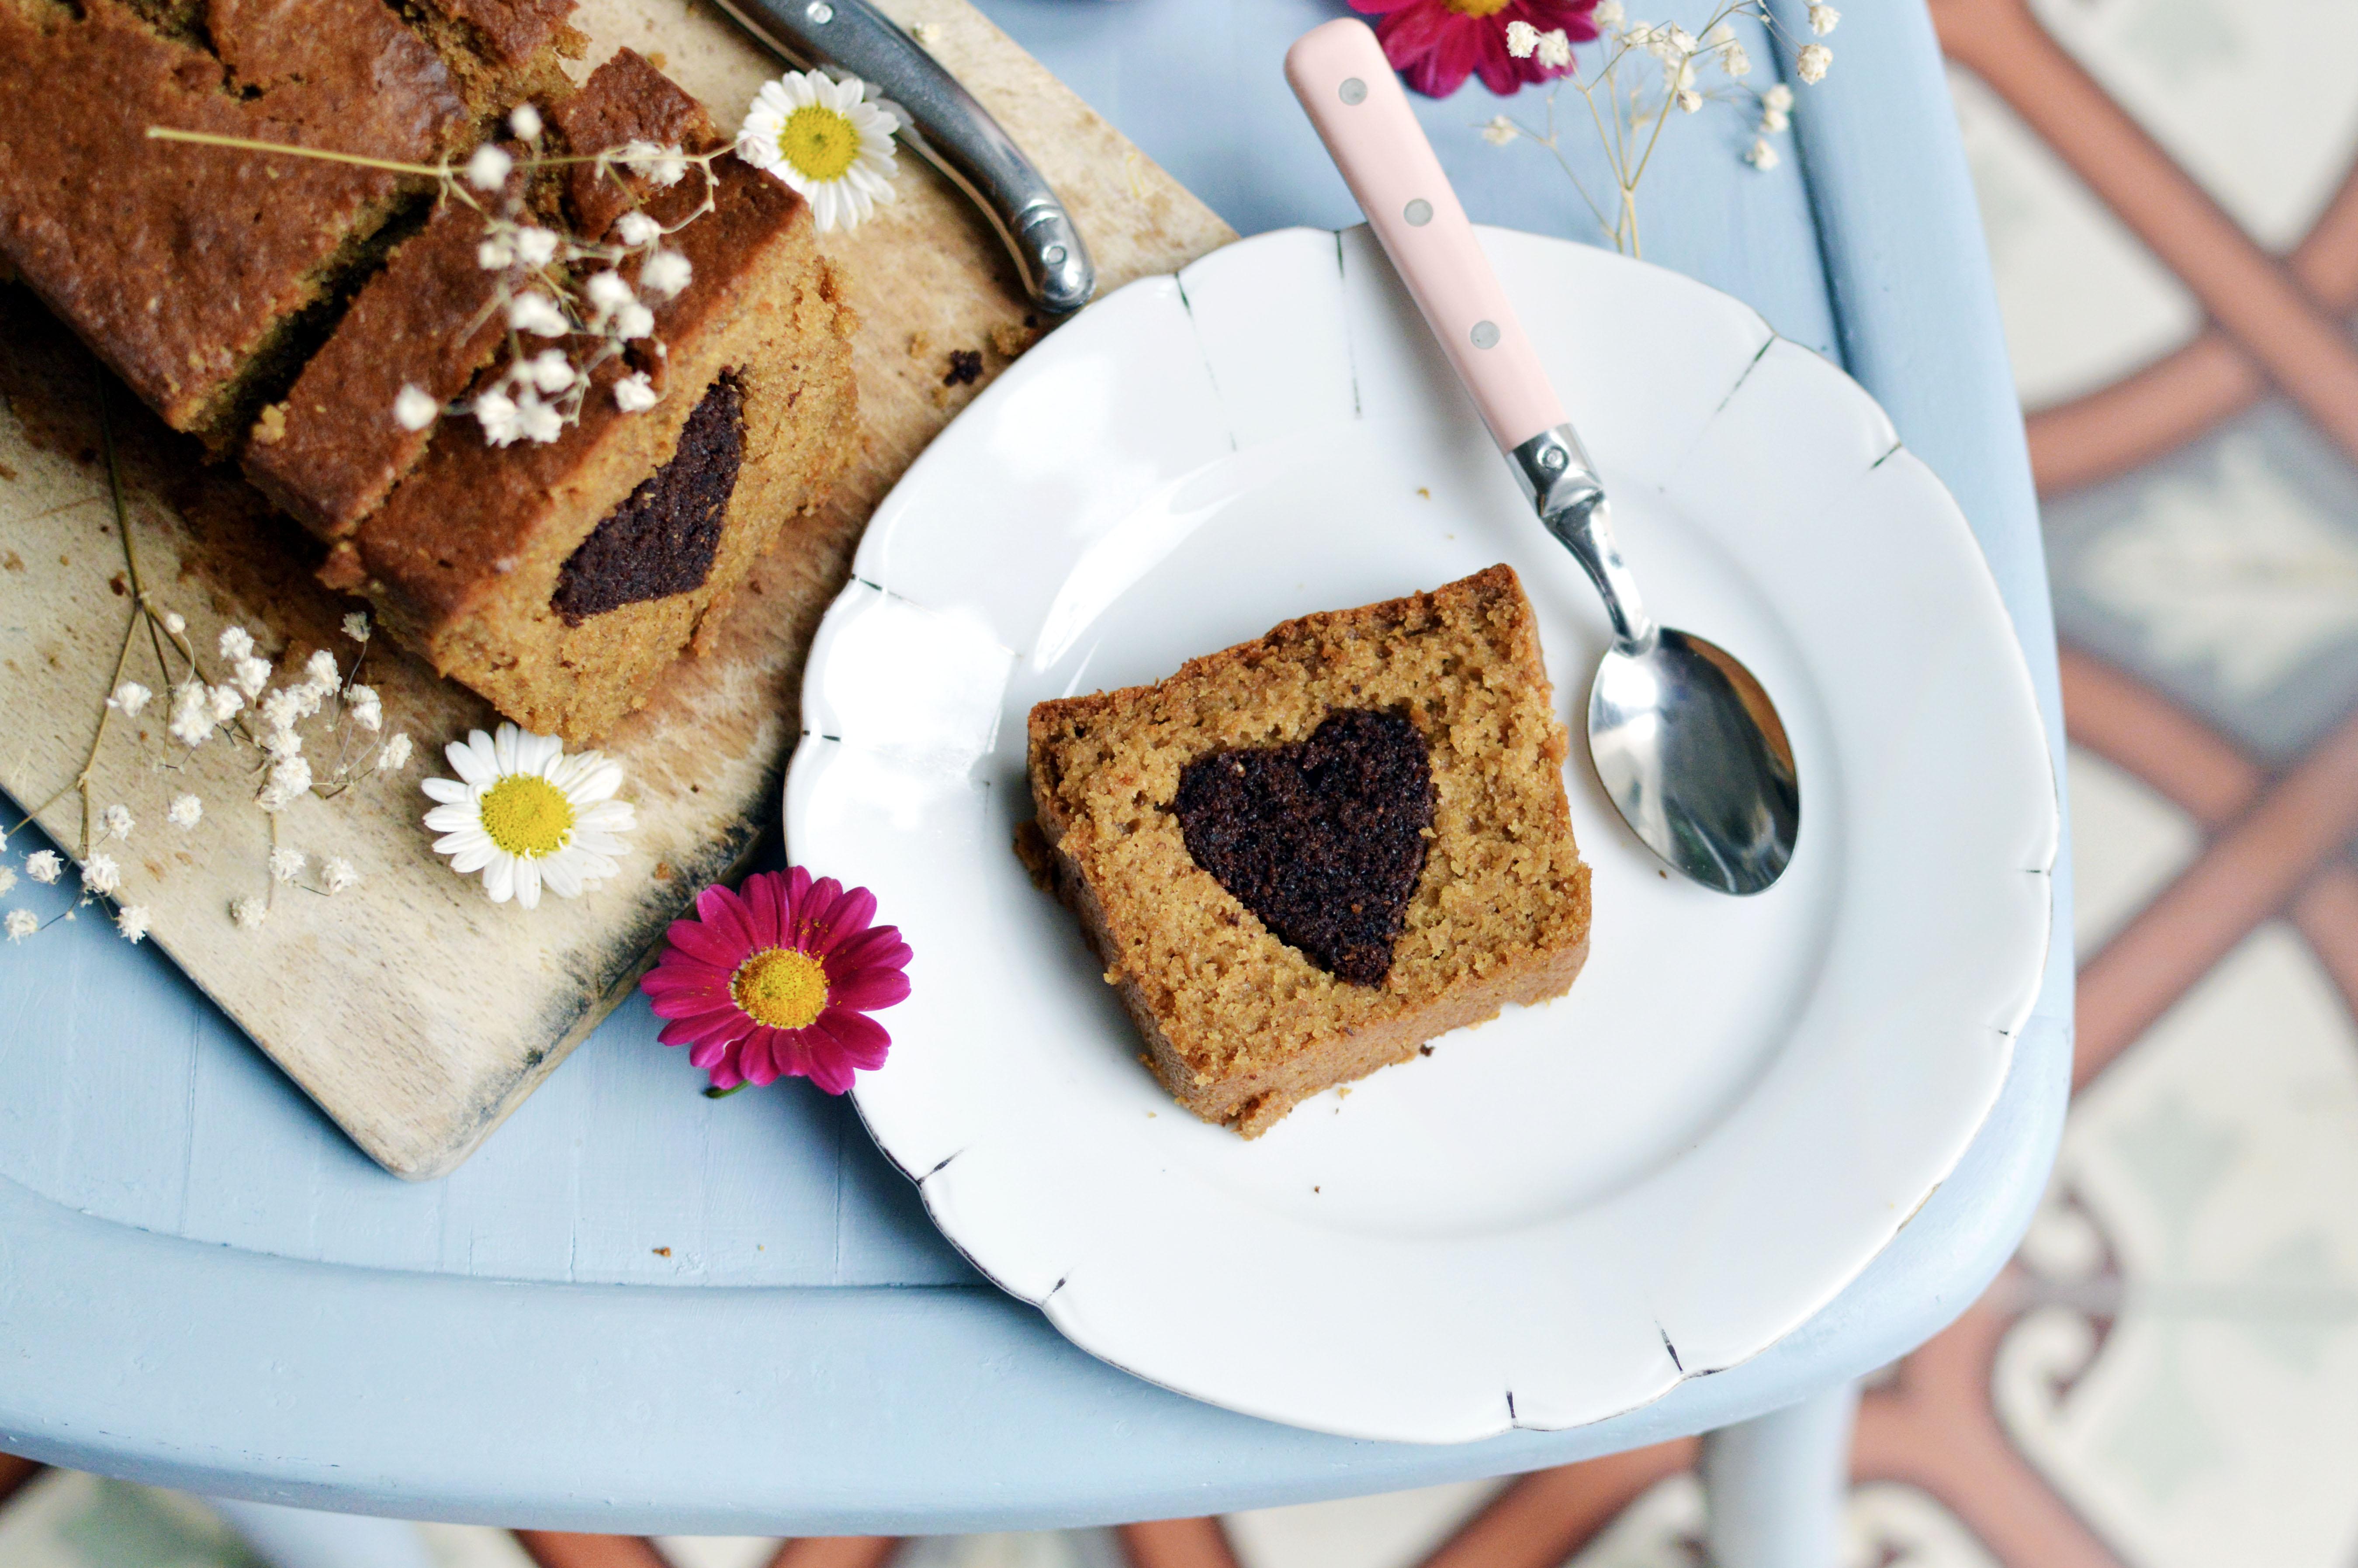 Heart cake vegan : faire un coeur dans un cake